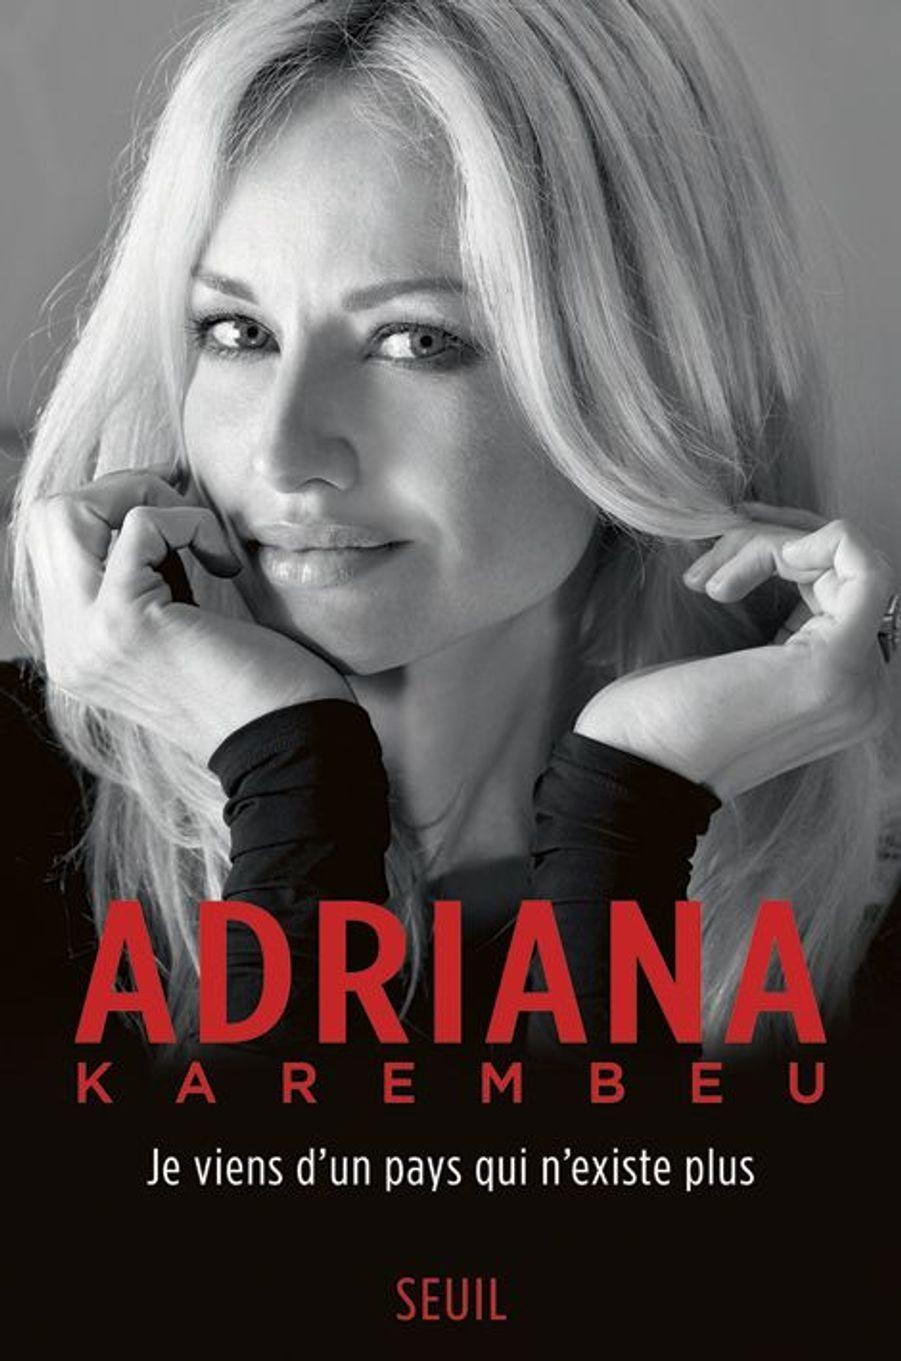 « Adriana Karembeu. Je viens d'un pays qui n'existe plus », éd. du Seuil, 18 euros.